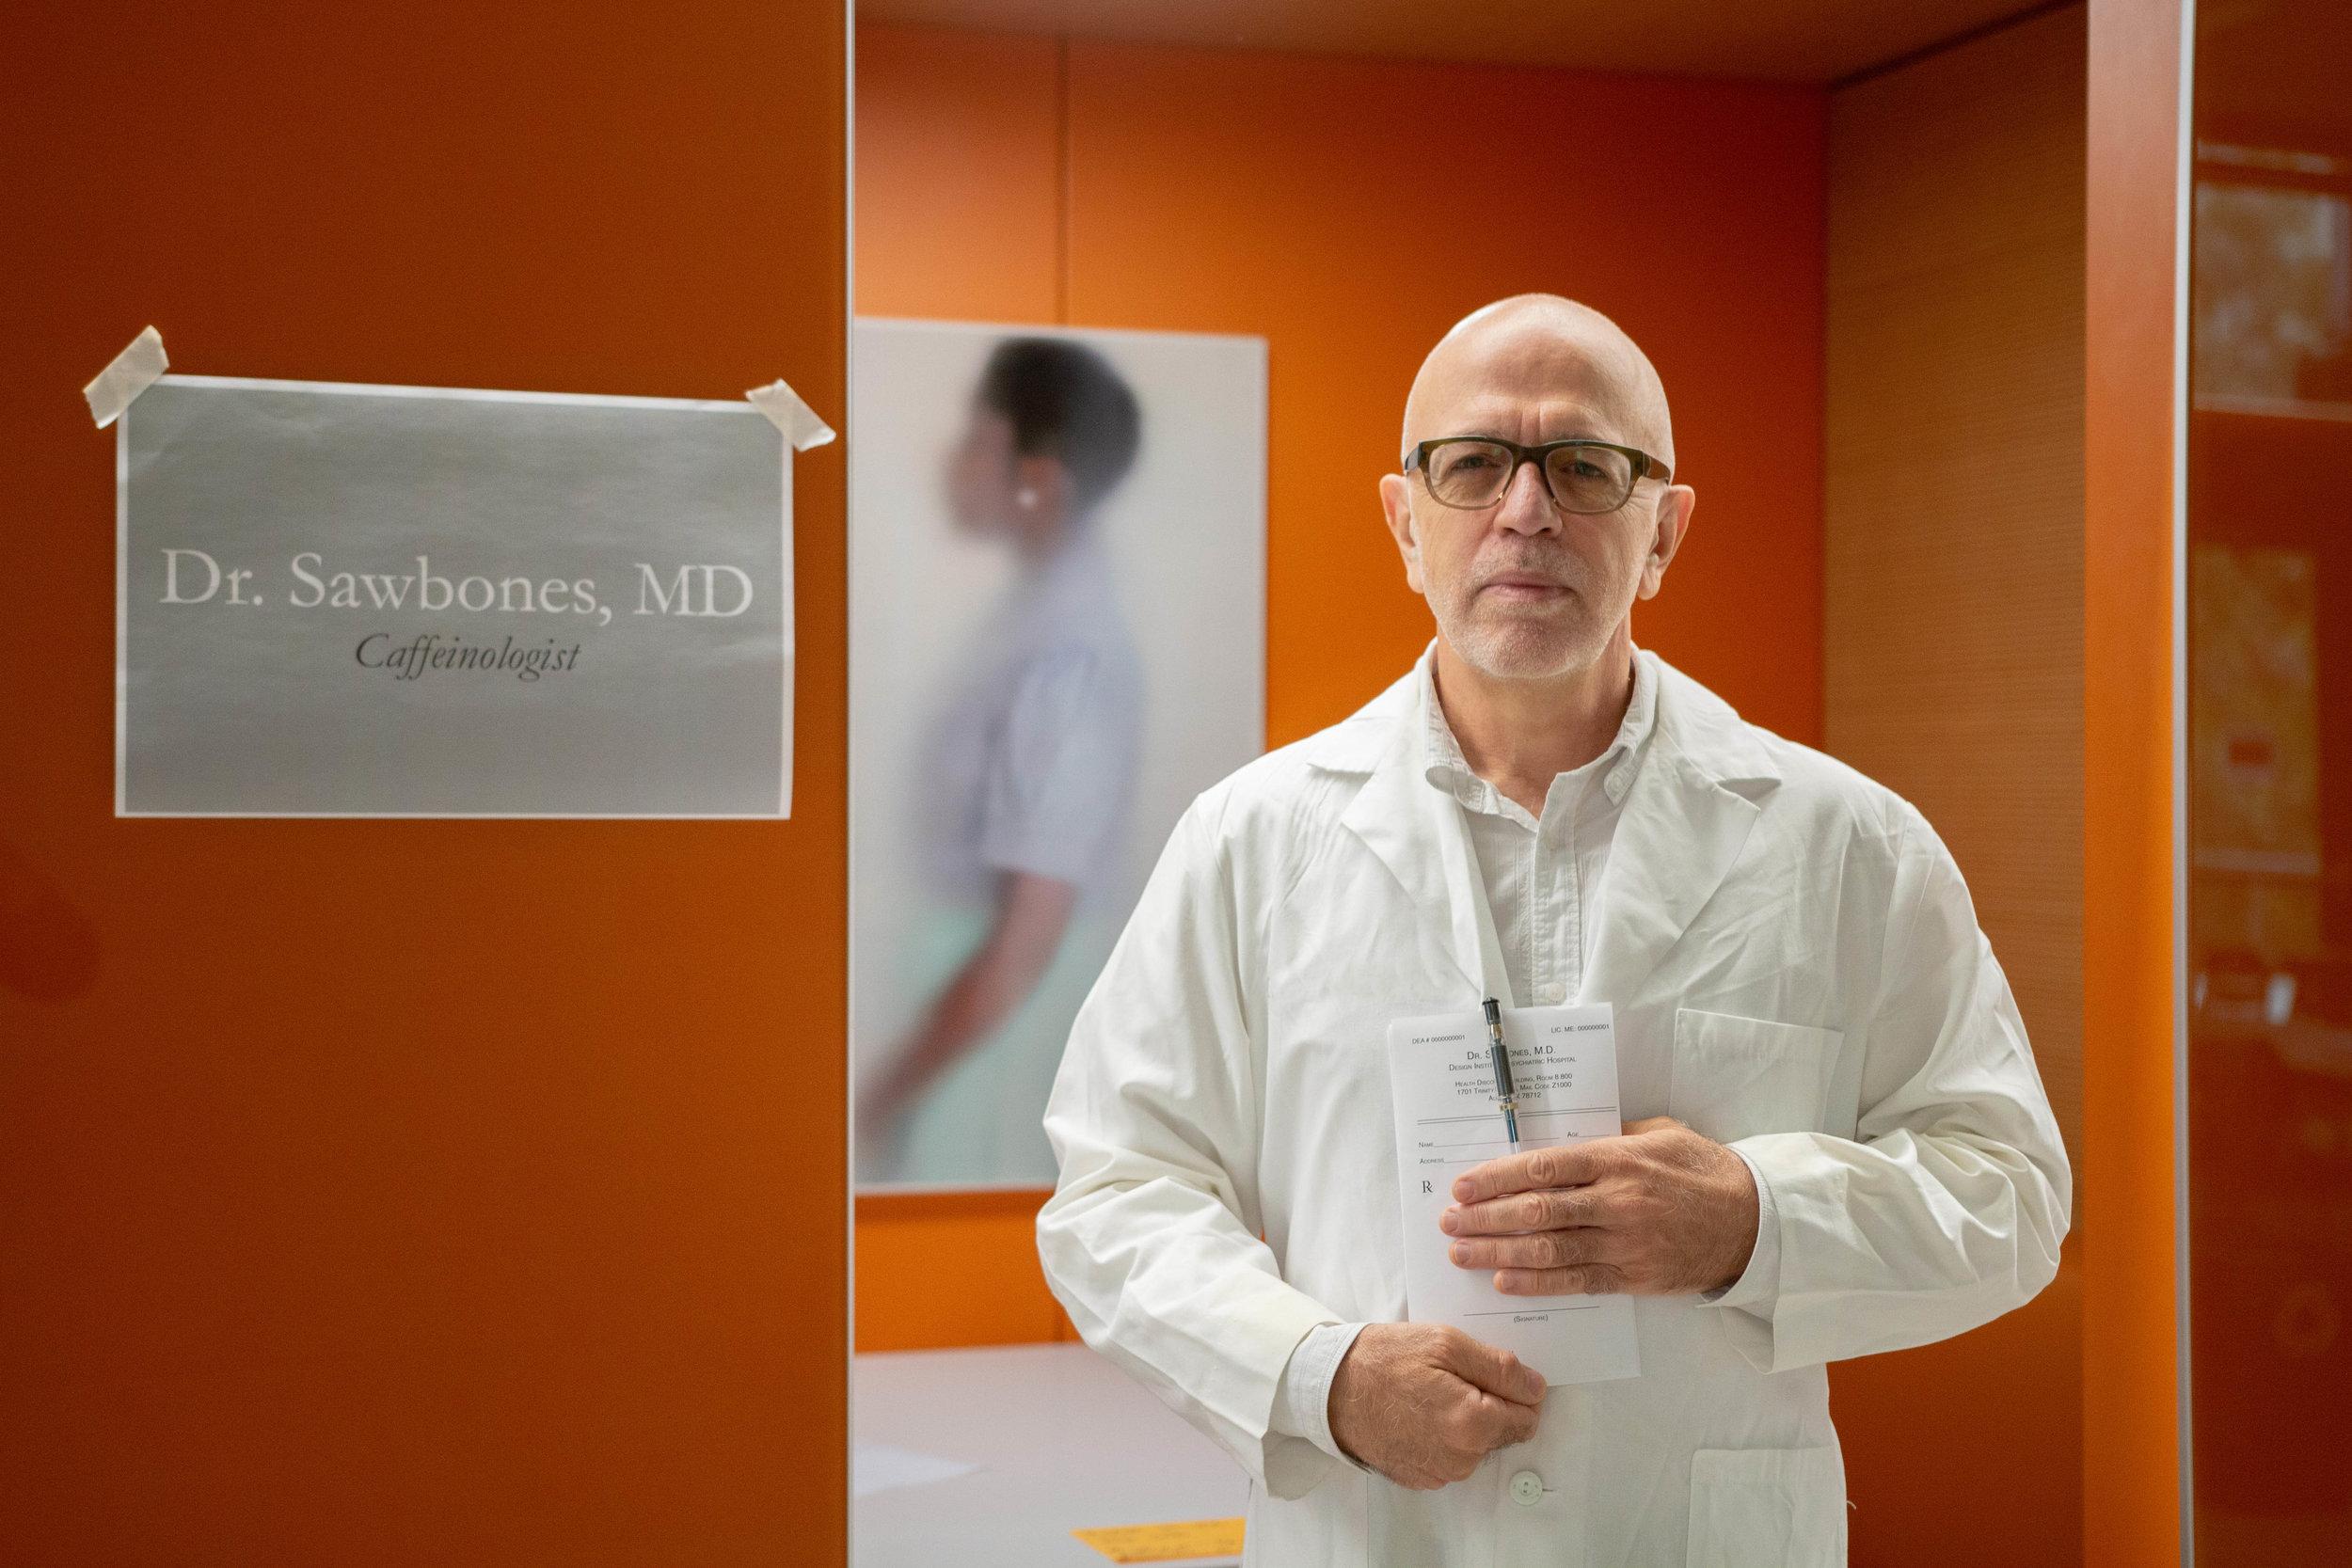 Dr. Sawbones, Caffeinologist (Jose Colucci)